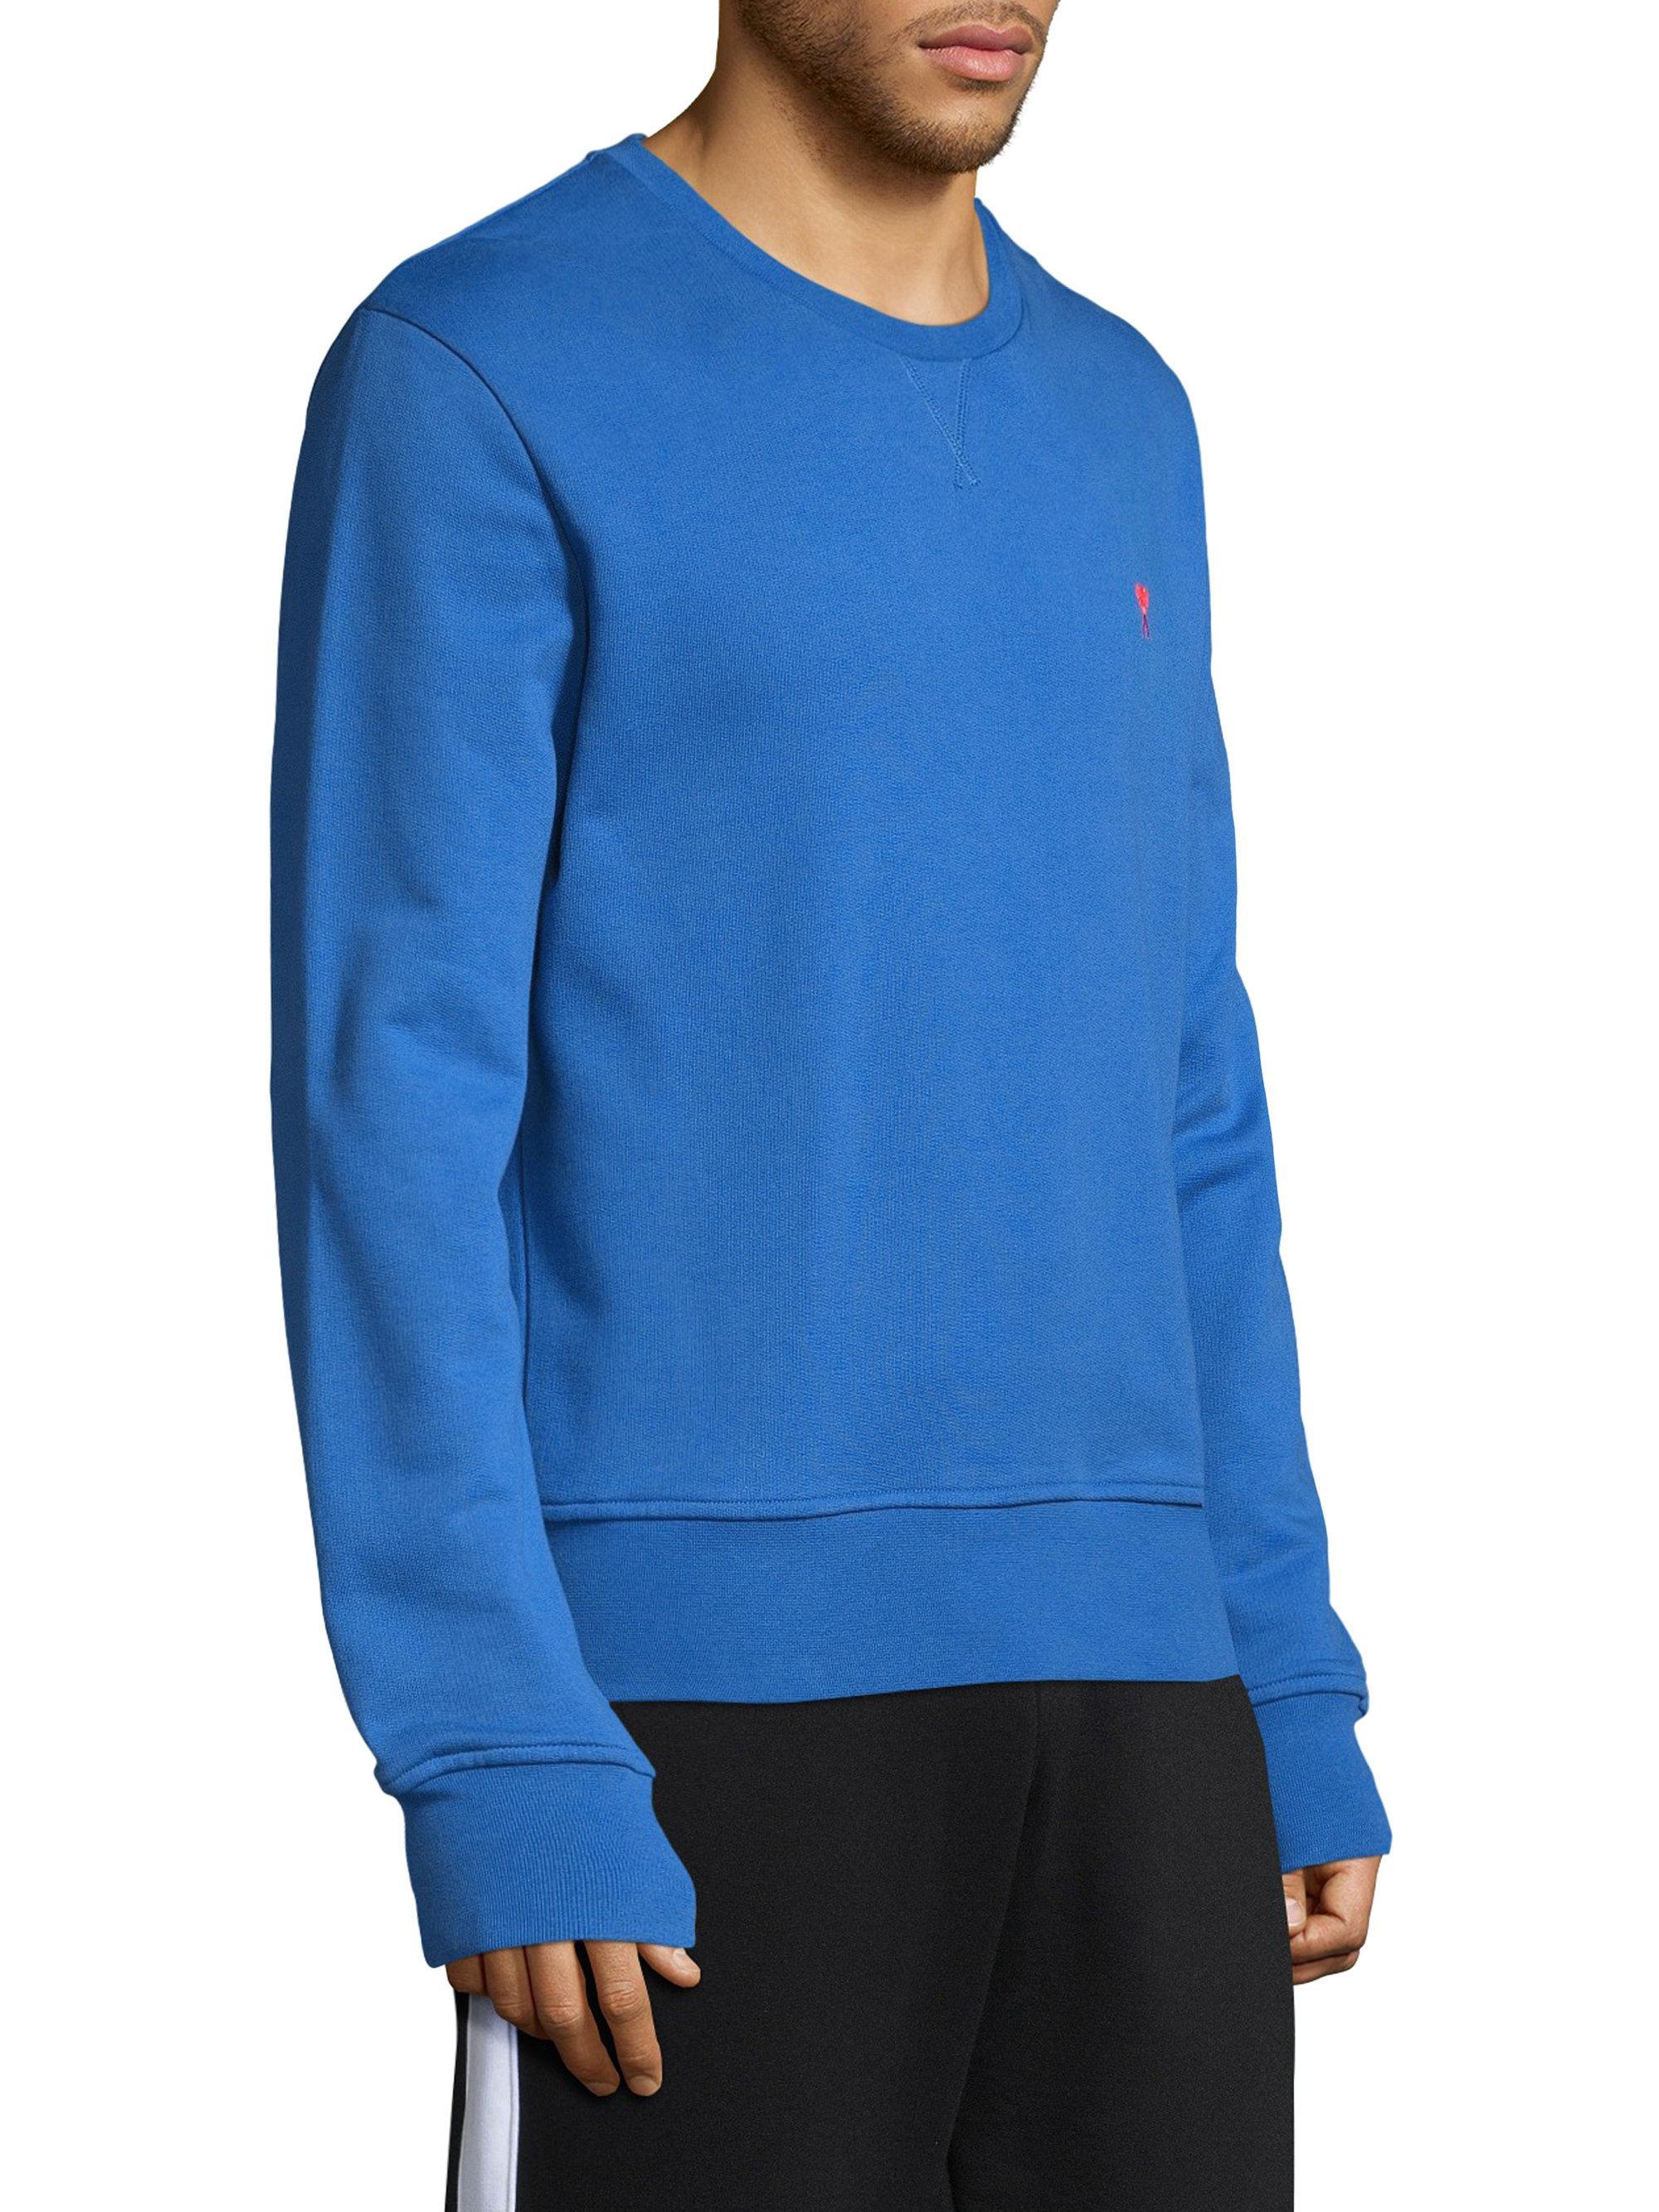 9455cb922c8 Lyst - AMI Heart Crewneck Sweatshirt in Blue for Men